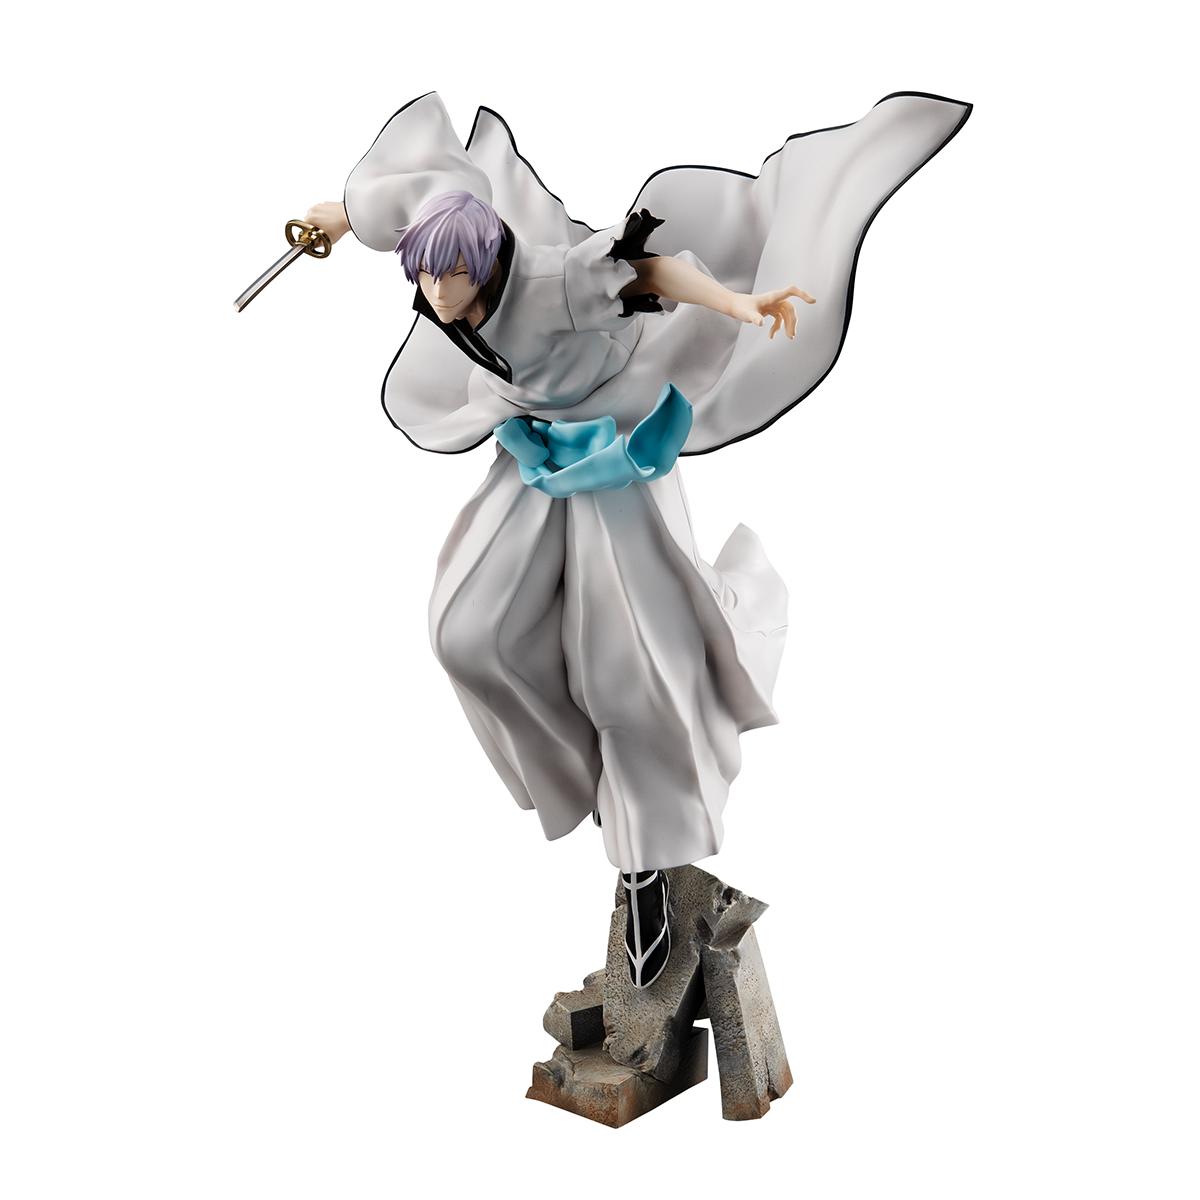 Ichimaru Gin Bleach GEM Series Figure